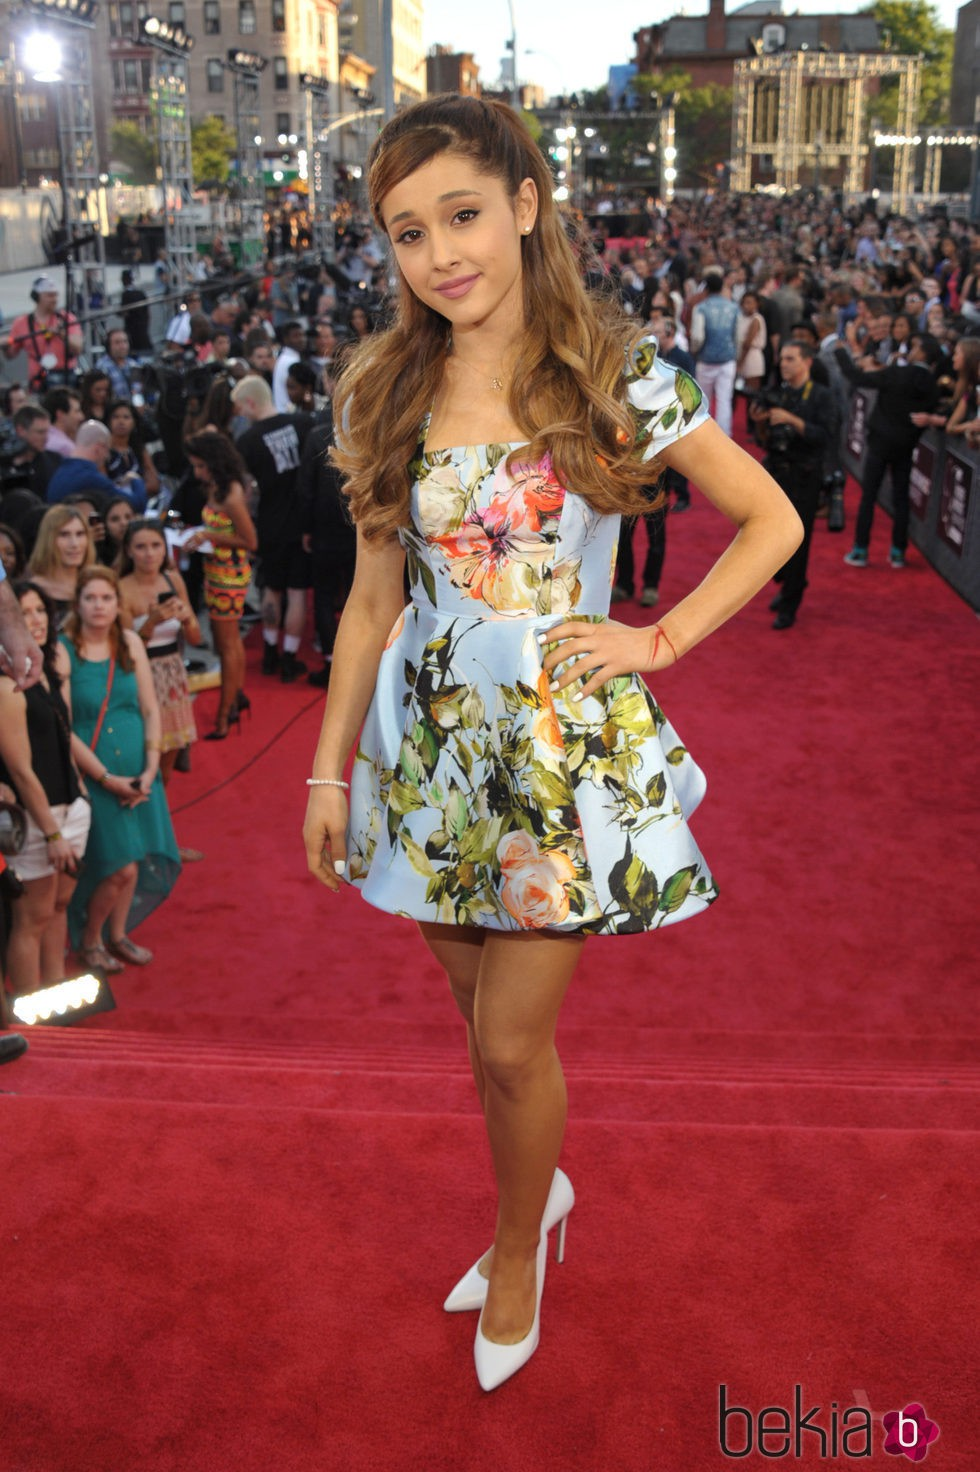 c63e16aaf Anterior Ariana Grande con un vestido rígido azul celeste con estampado  floral